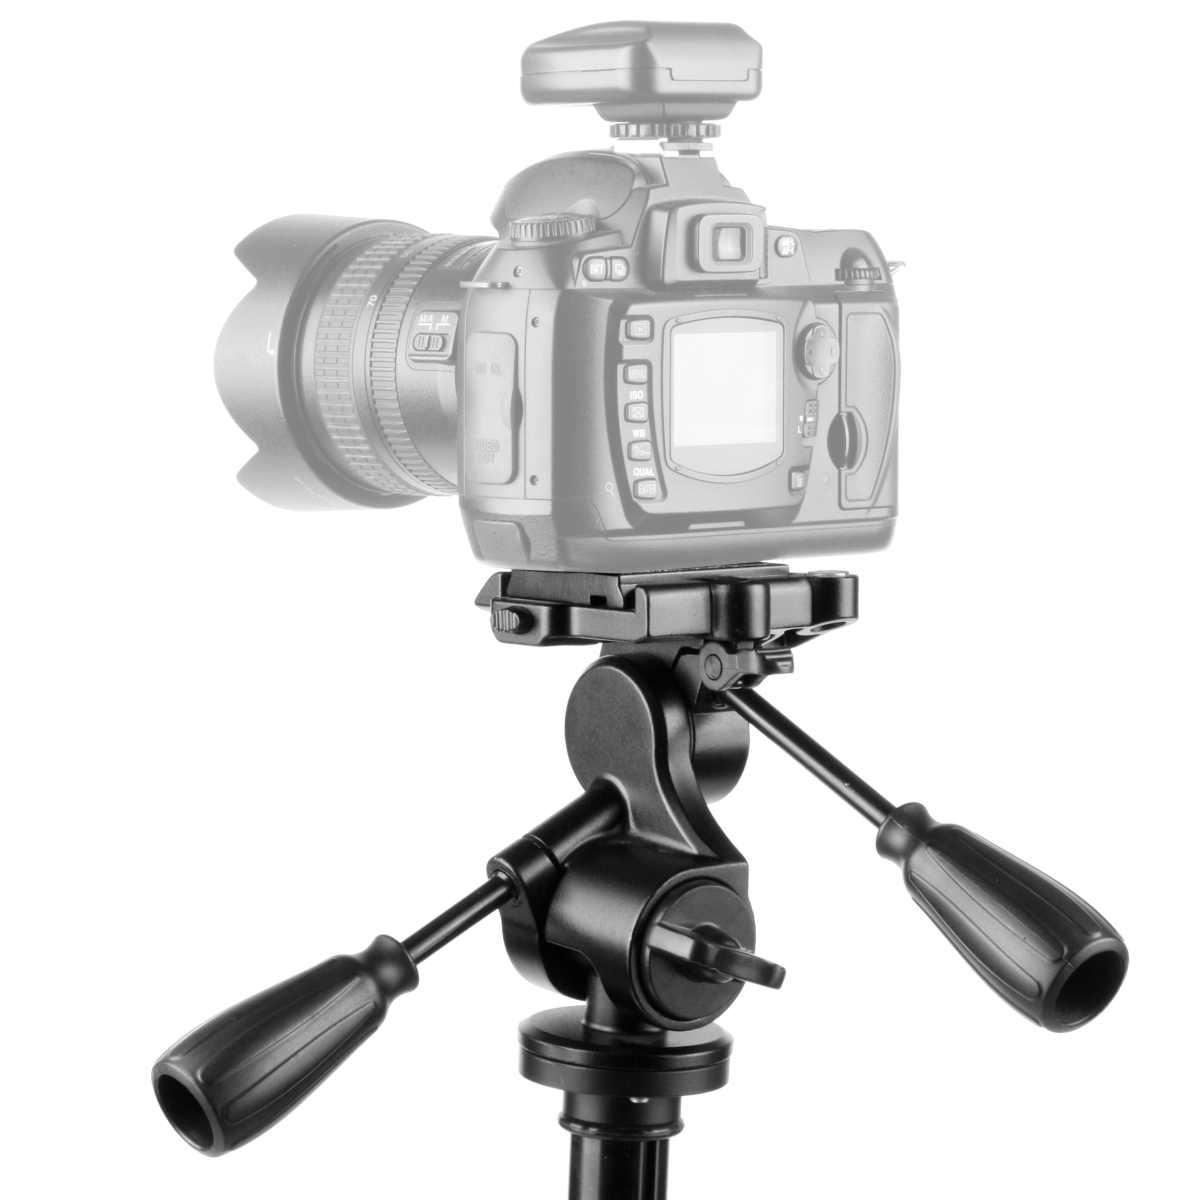 Walimex pro FT-6653H Aluminum Pro 3D Panhead